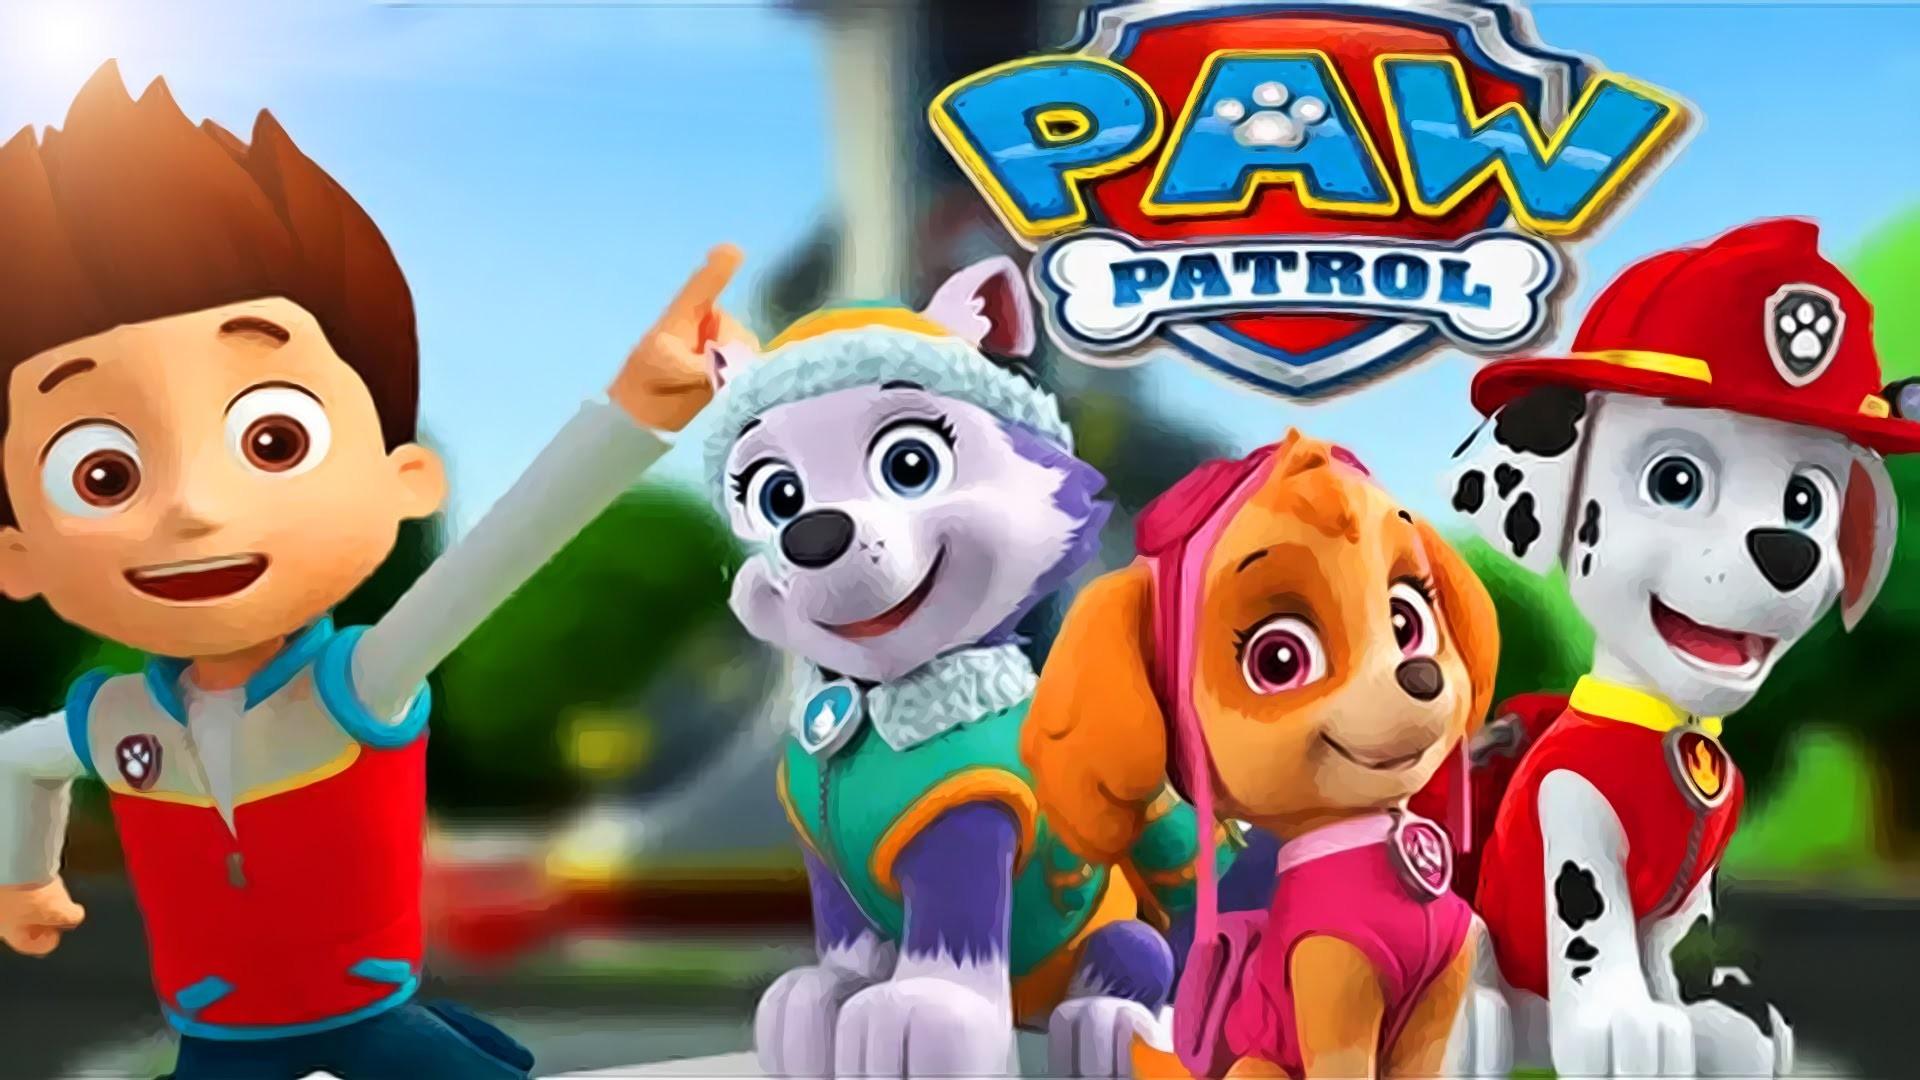 paw patrol wallpapers ·① wallpapertag